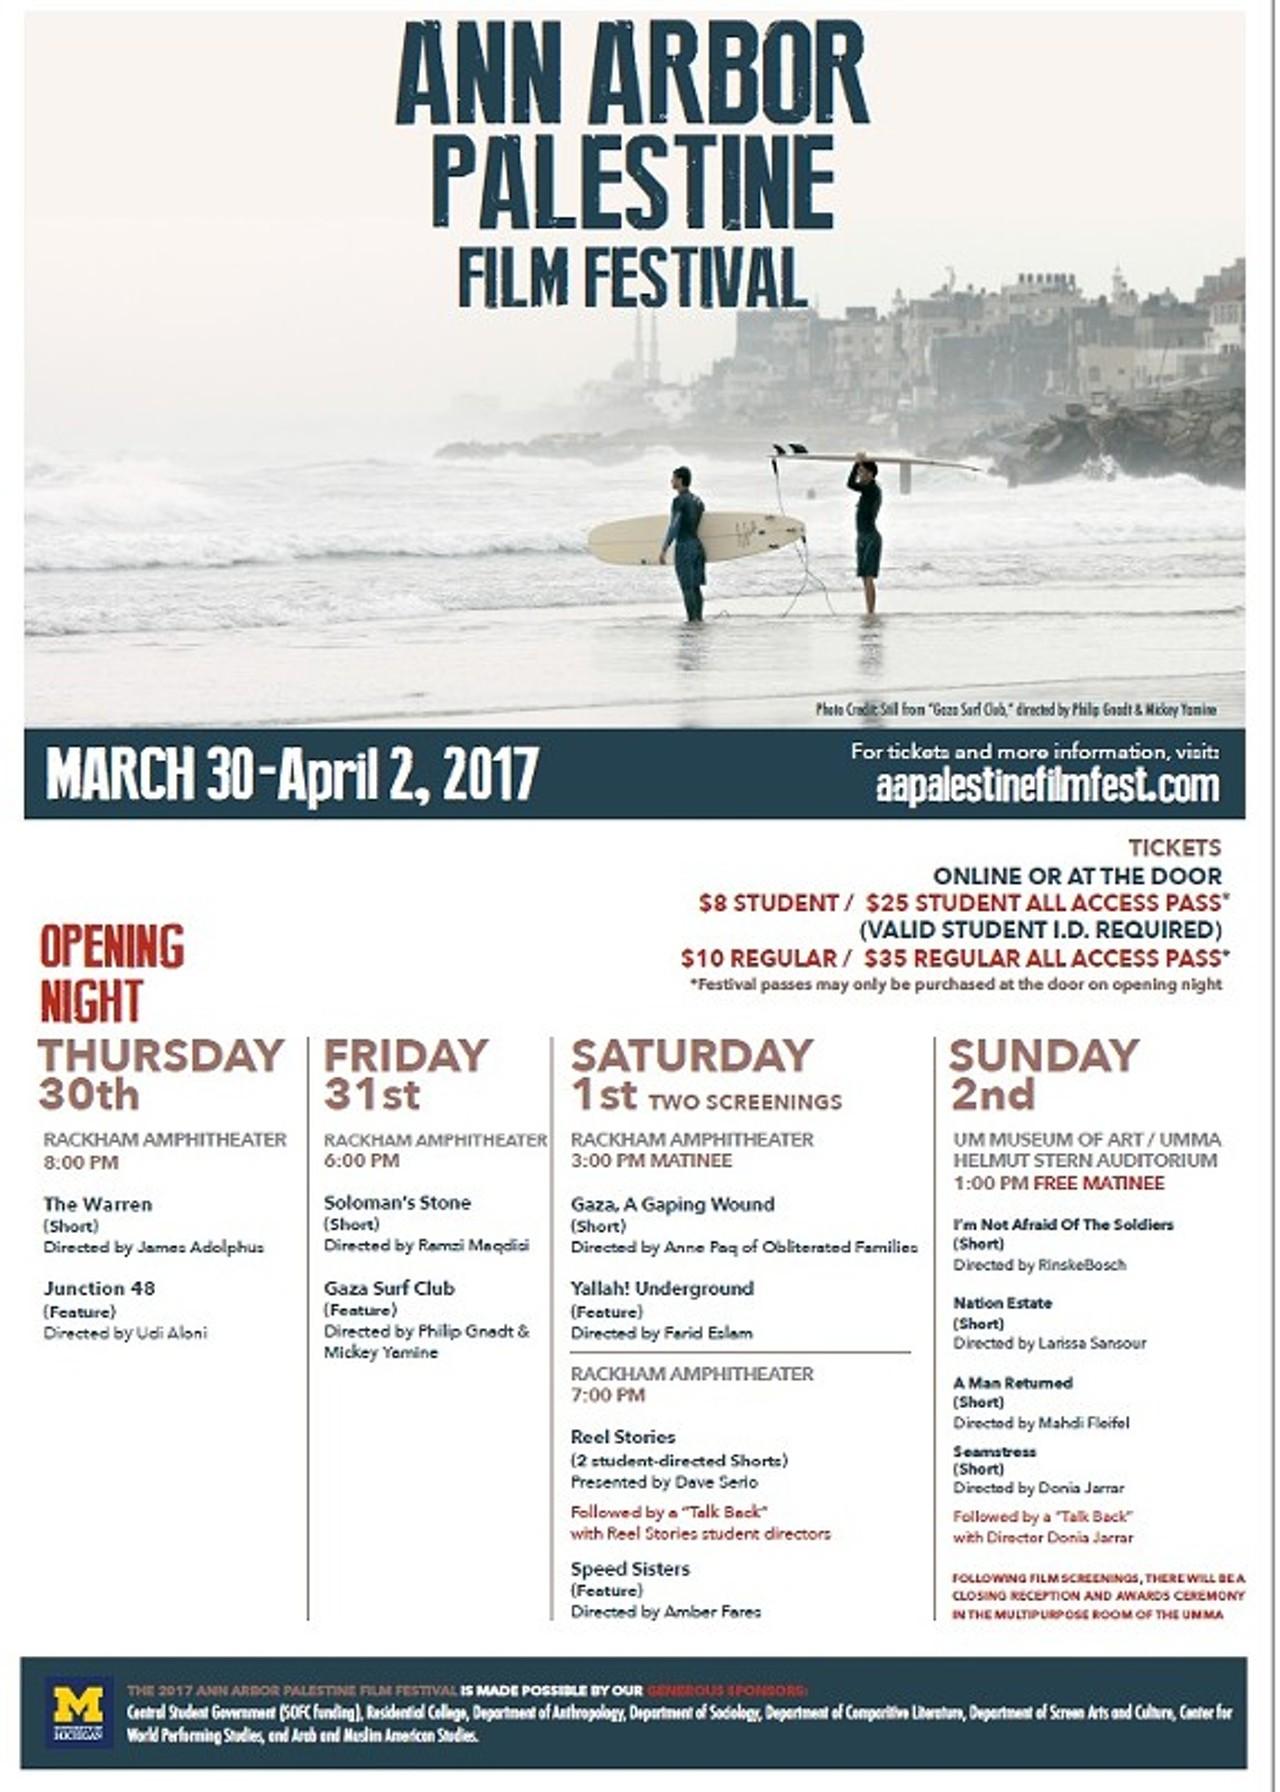 Ann Arbor Film Festival - Wikipedia